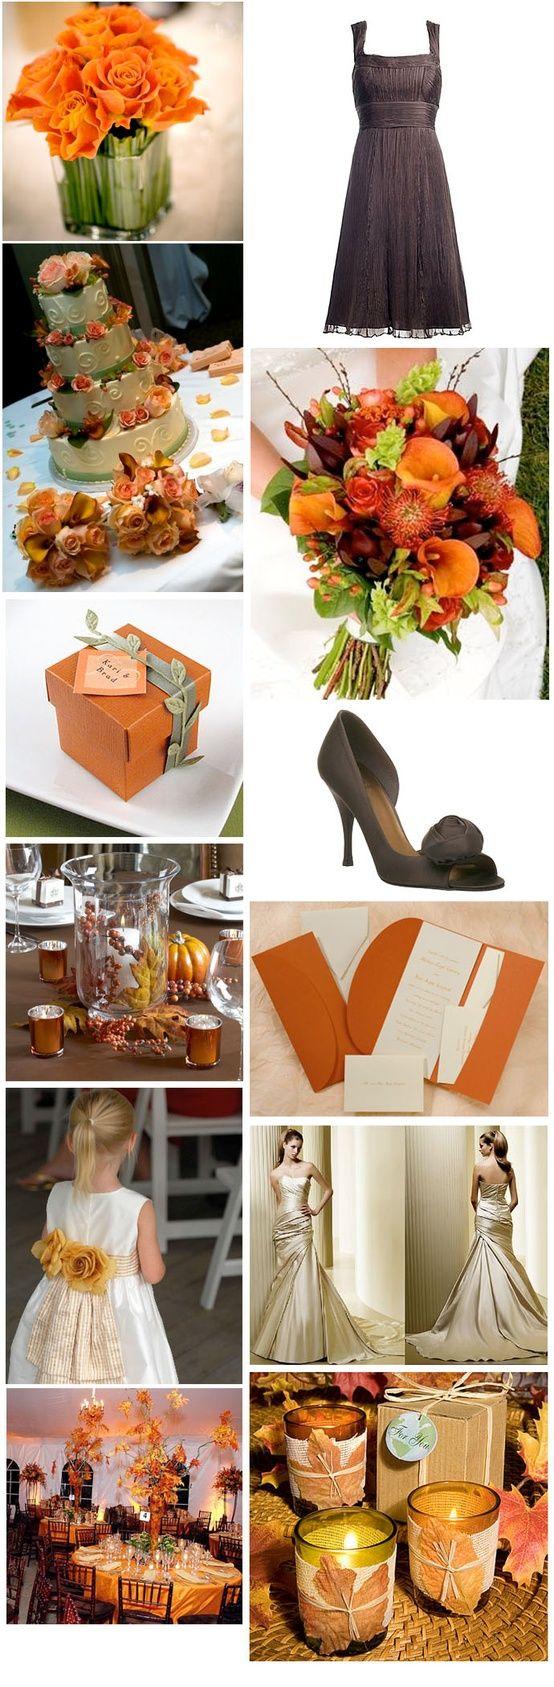 Wedding decorations using wine bottles october 2018  best Fall Wedding Trends  Sugar Creek images on Pinterest